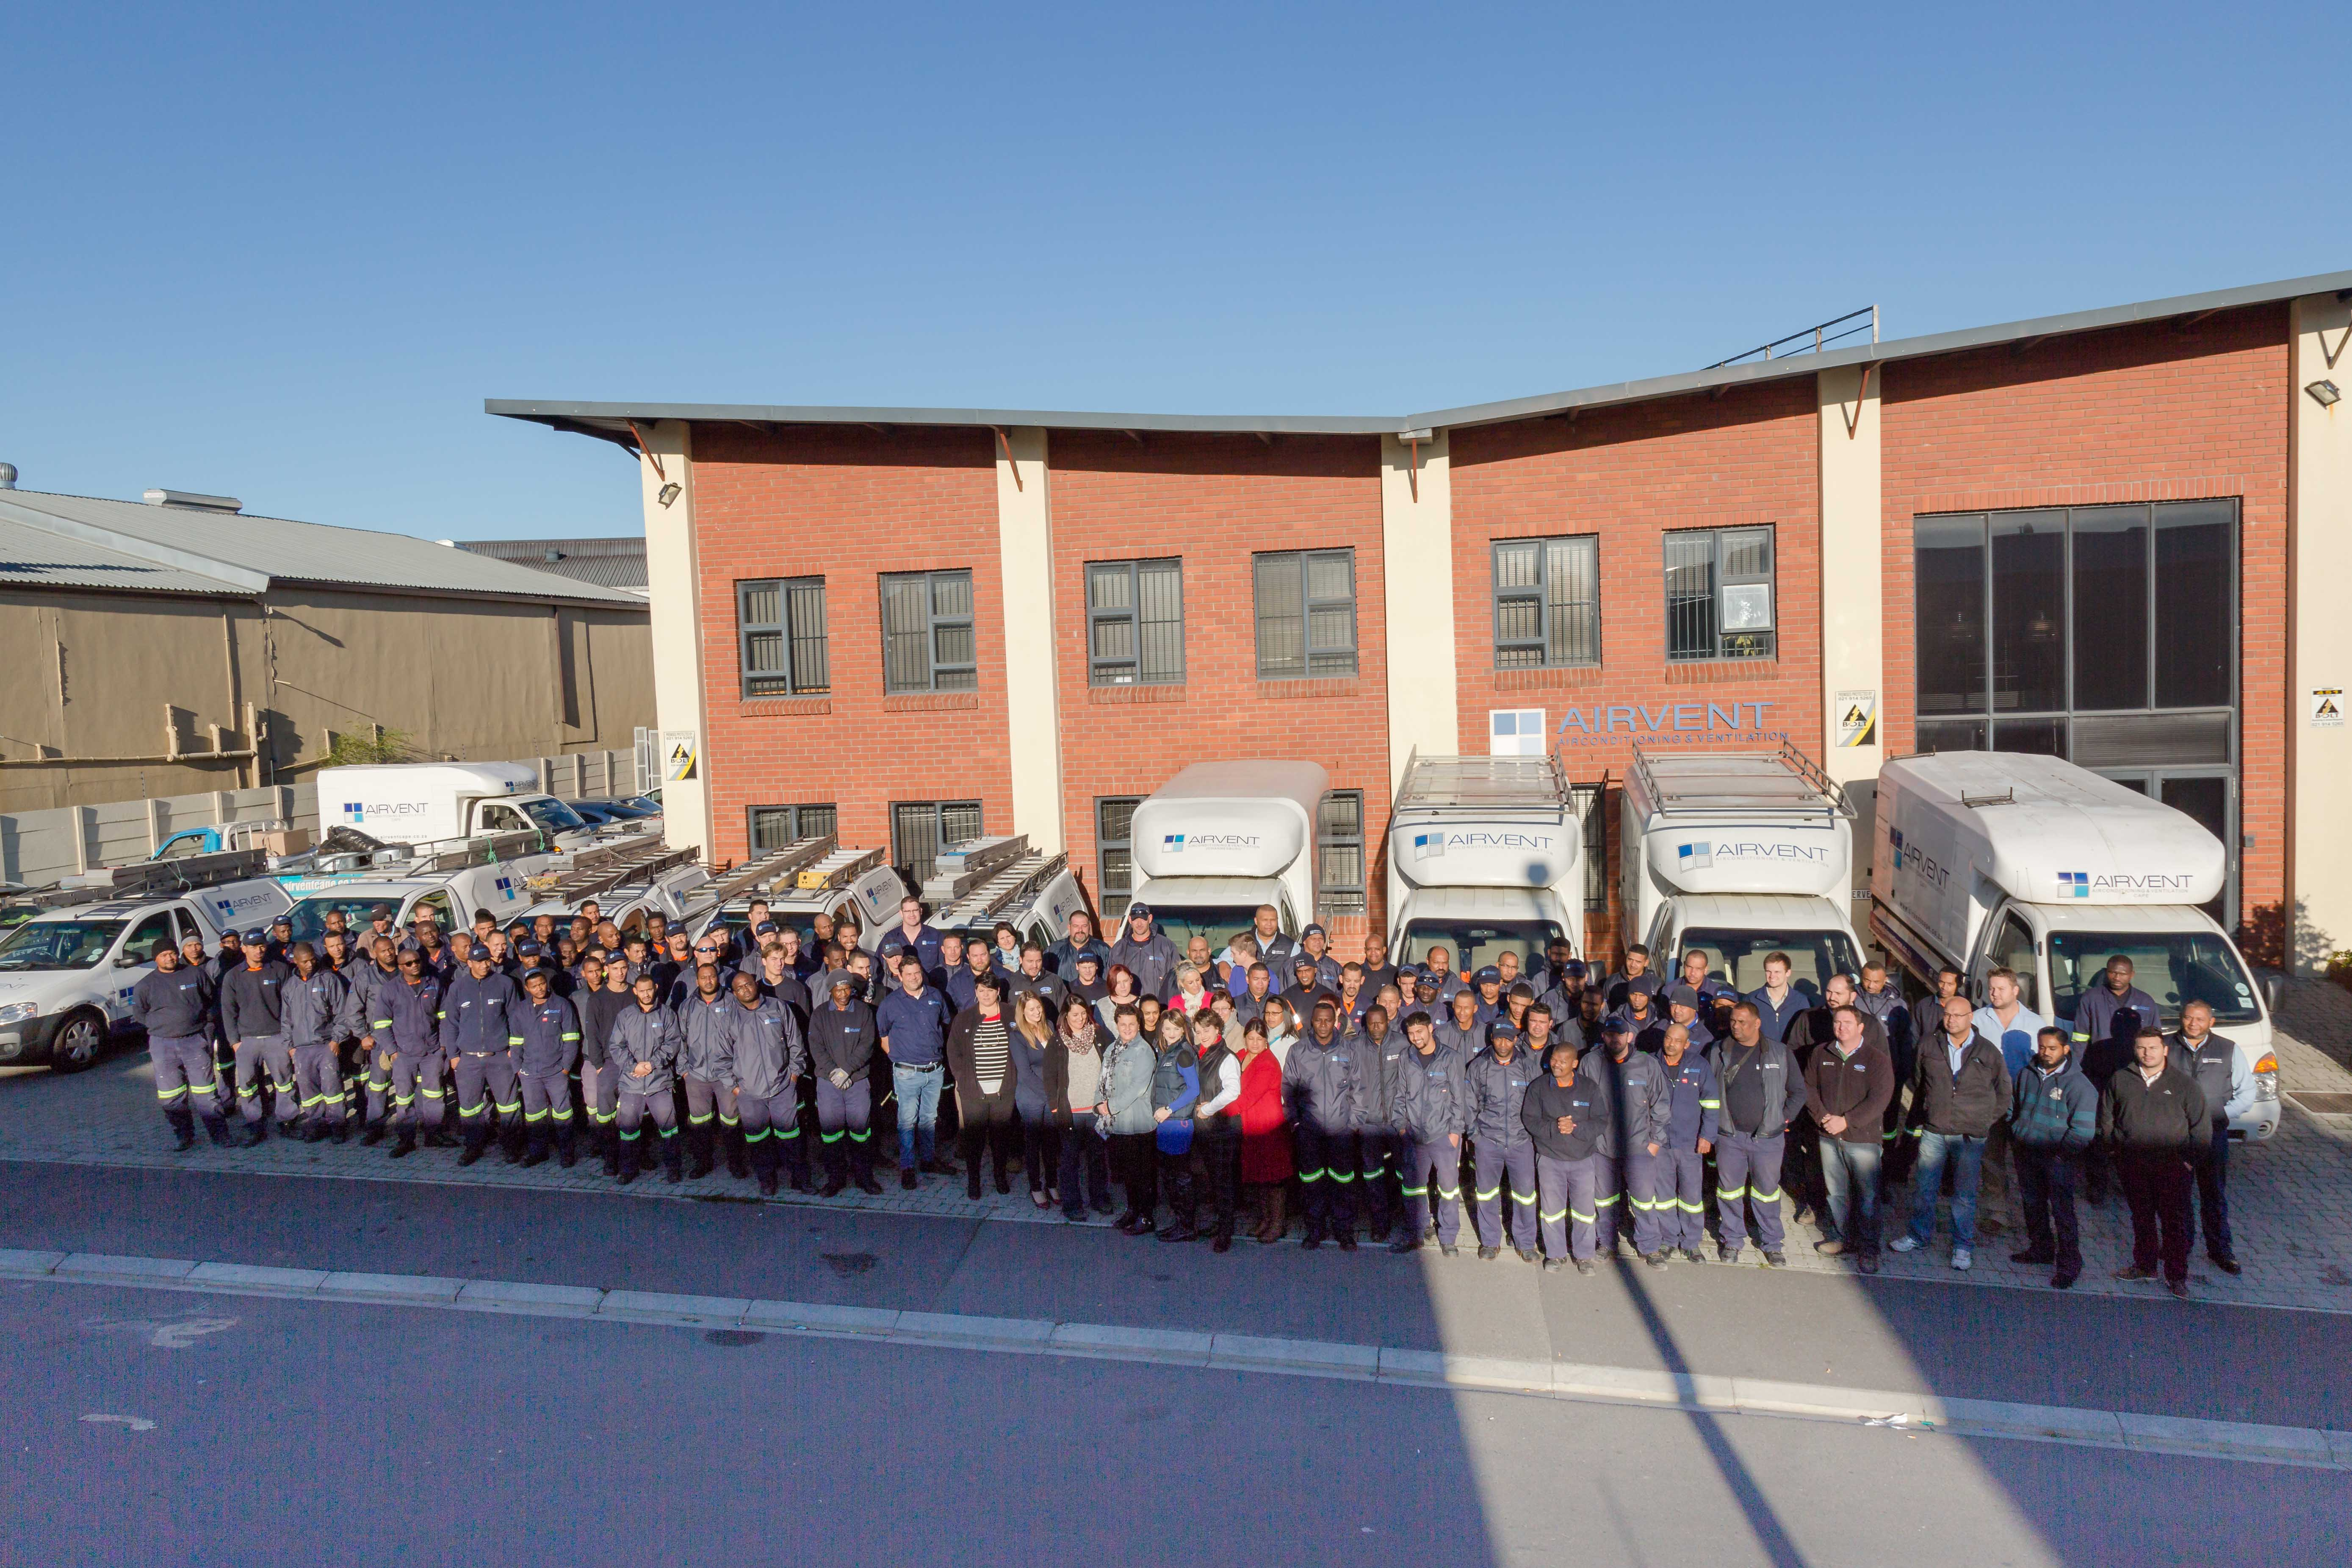 Airvent Airconditioning & Ventilation: Team